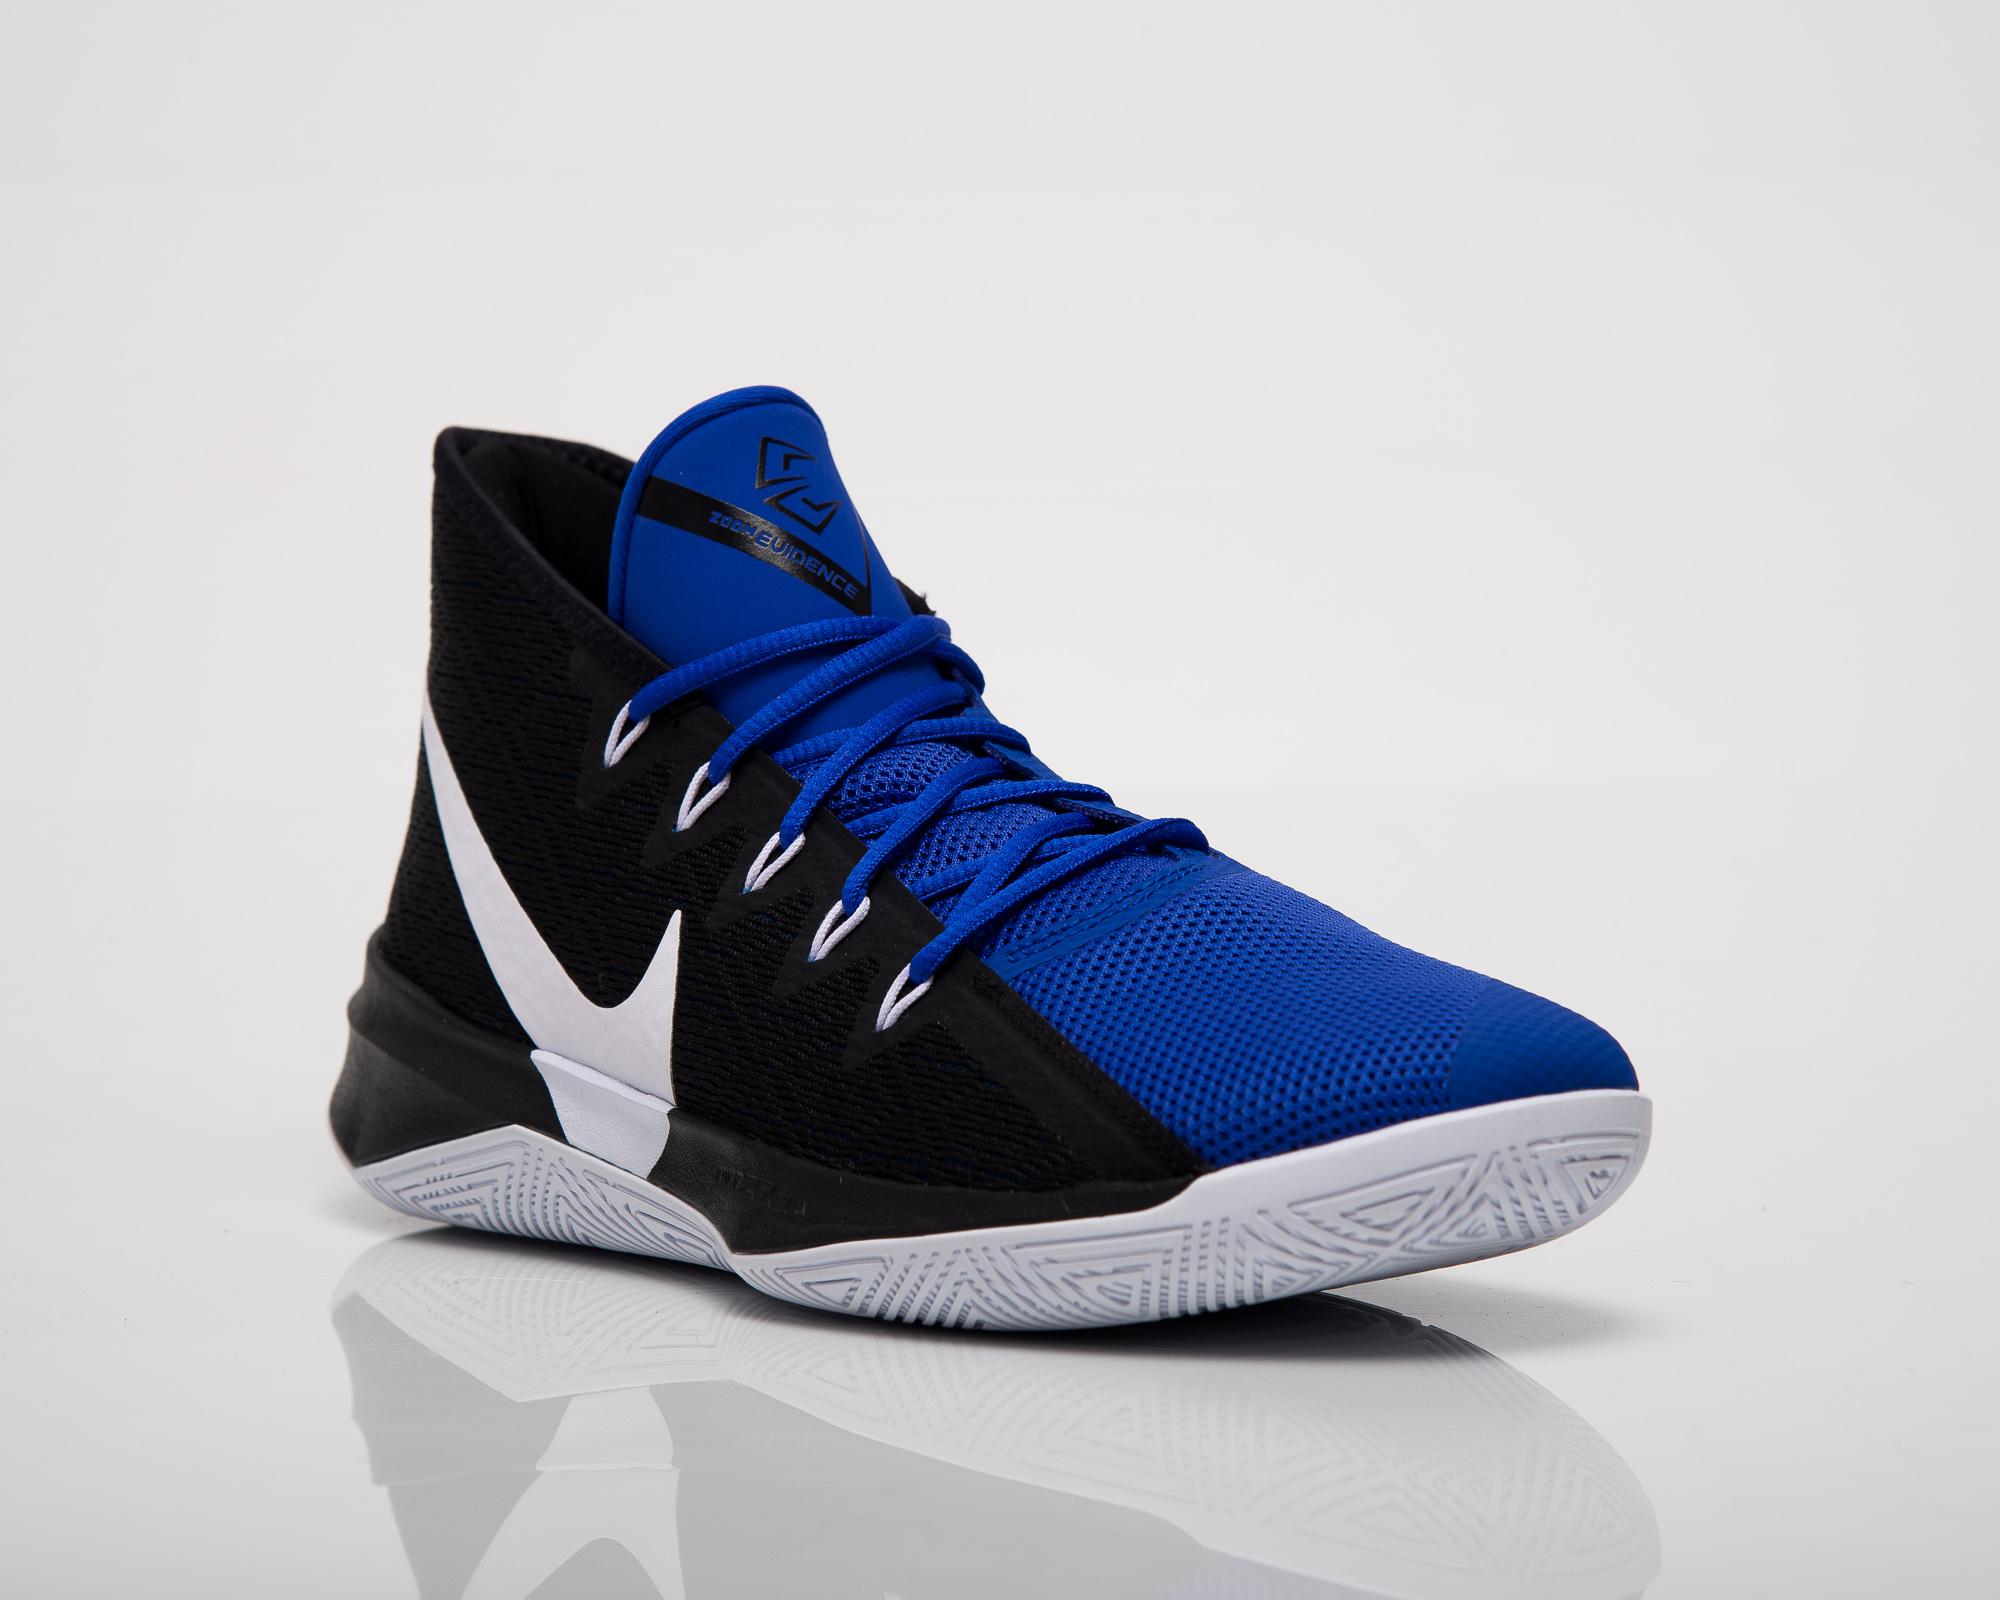 promo code c2ae2 0f6d9 Nike Zoom Evidence III